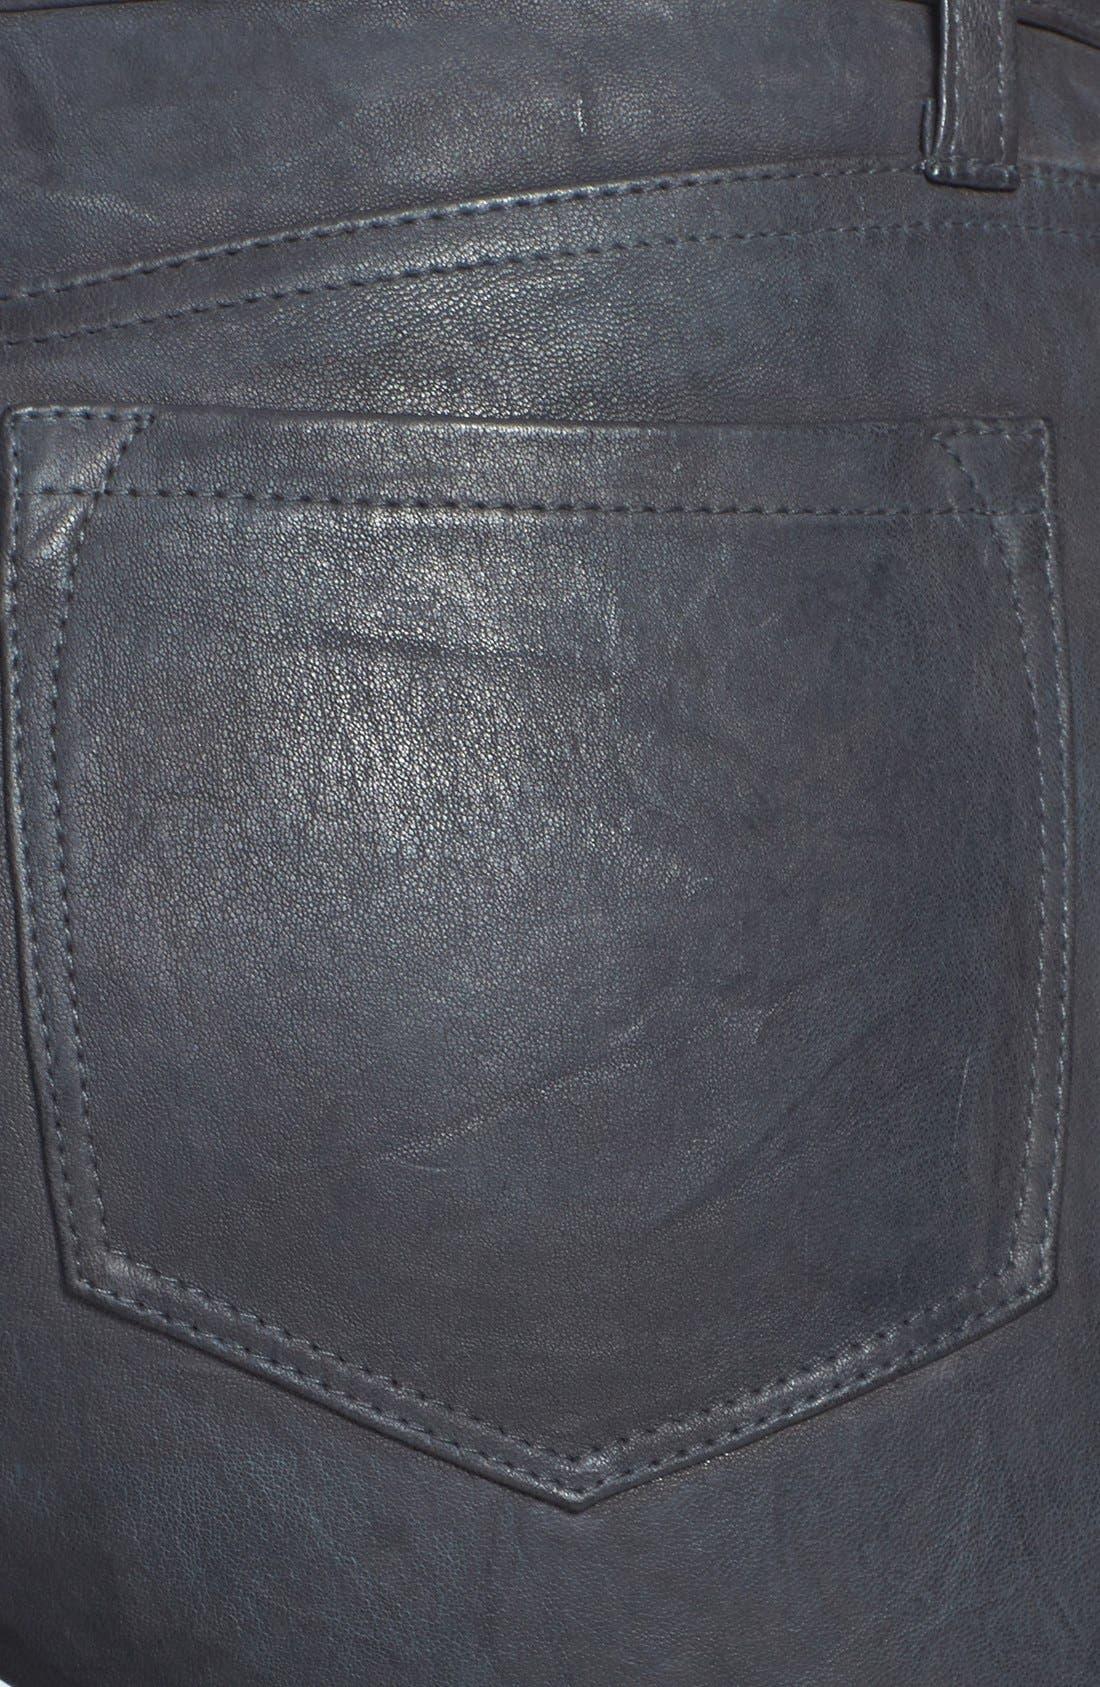 '8001' Lambskin Leather Pants,                             Alternate thumbnail 55, color,